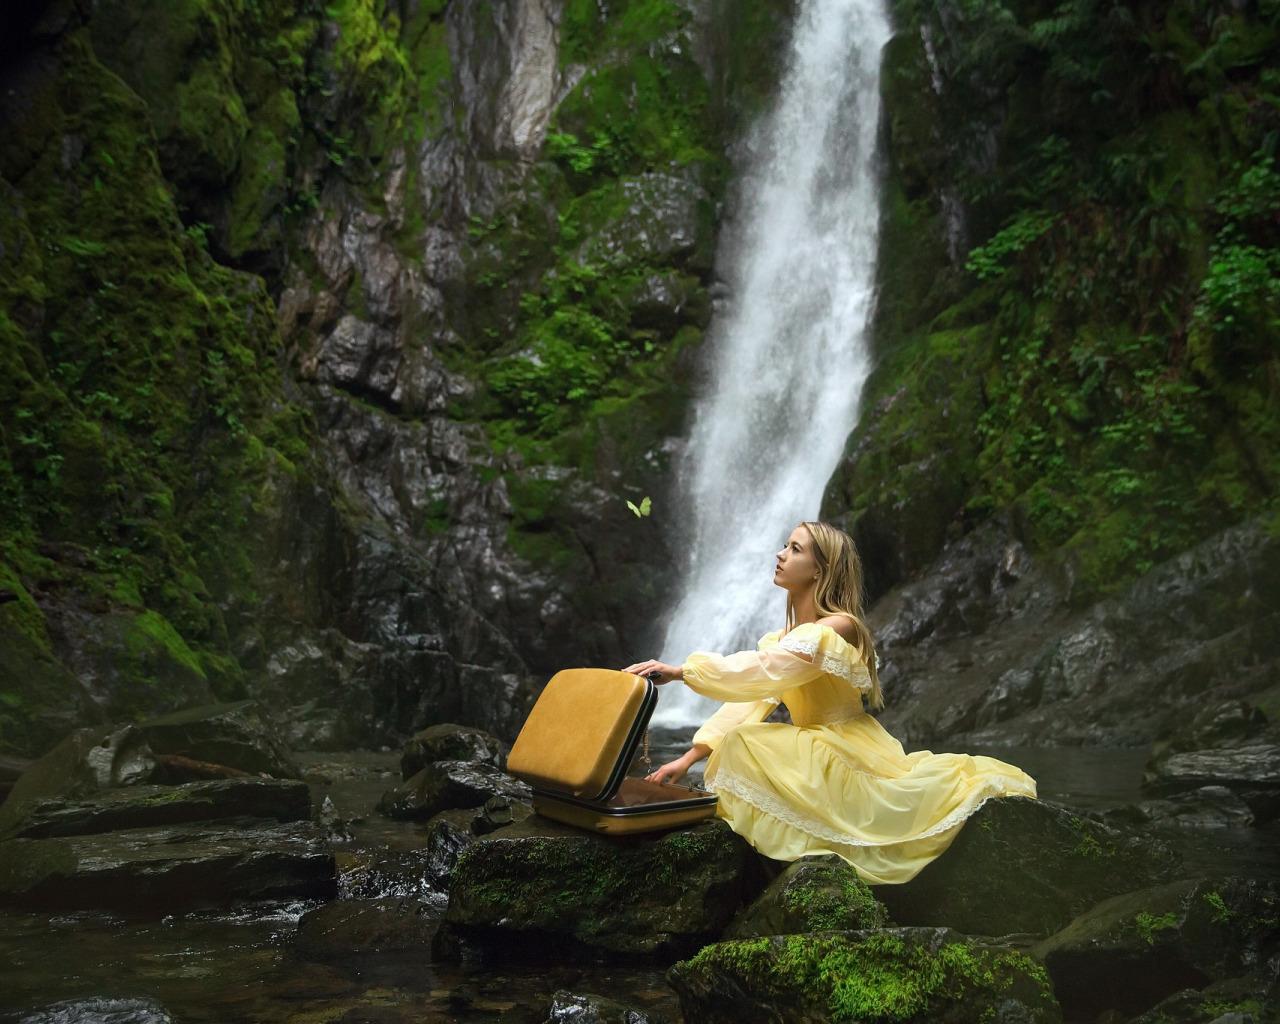 рыжая девушка возле водопада предлагаем клиентам